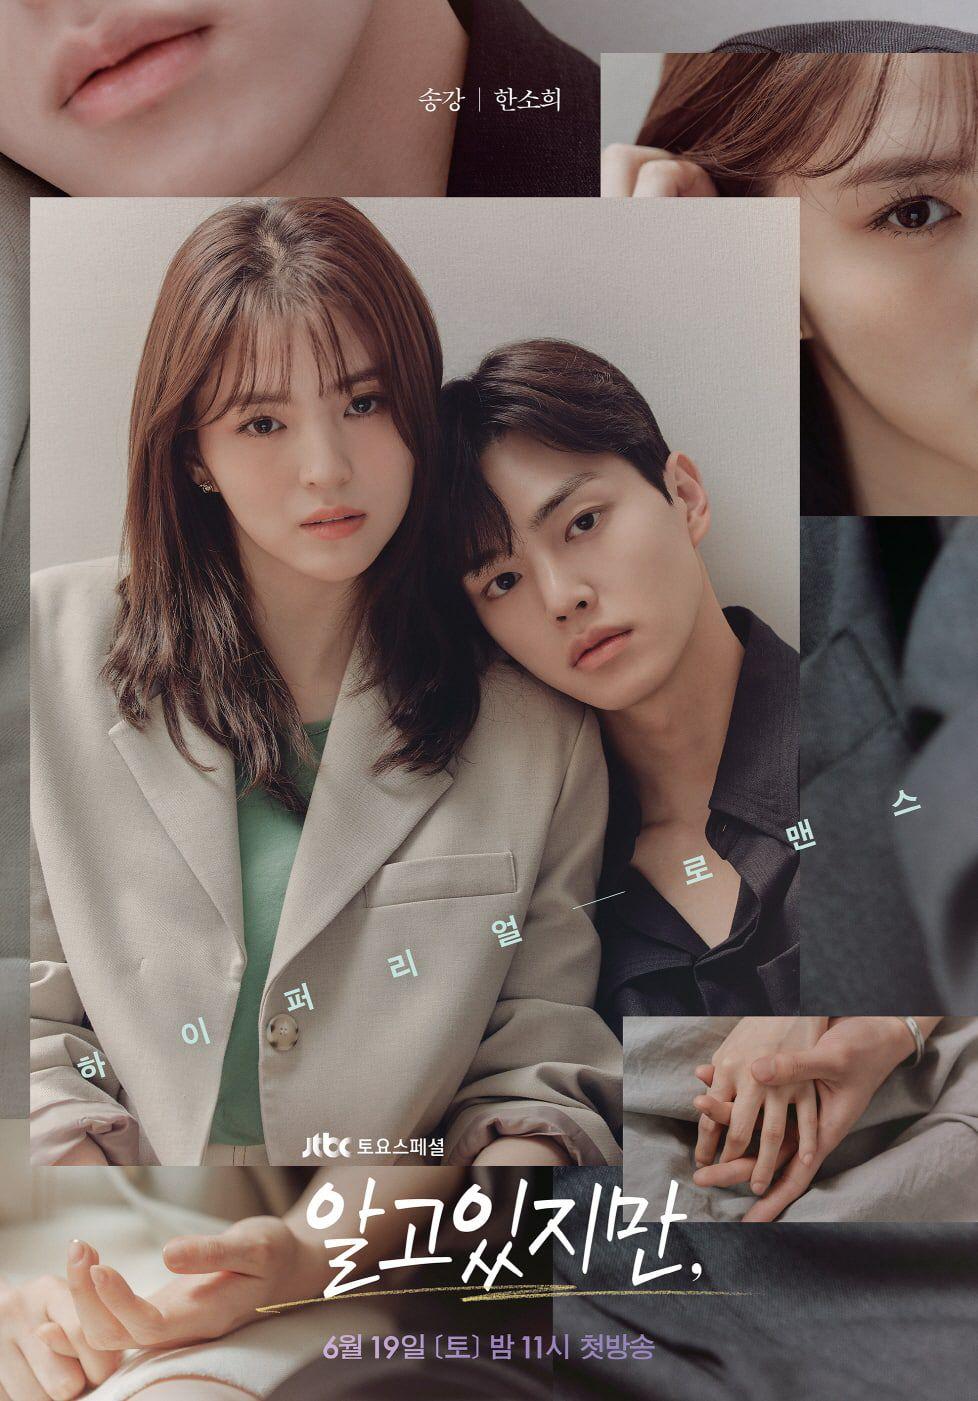 Nevertheless Season 1 Episode 1 - 4 (Korean Drama) | Mp4 Download